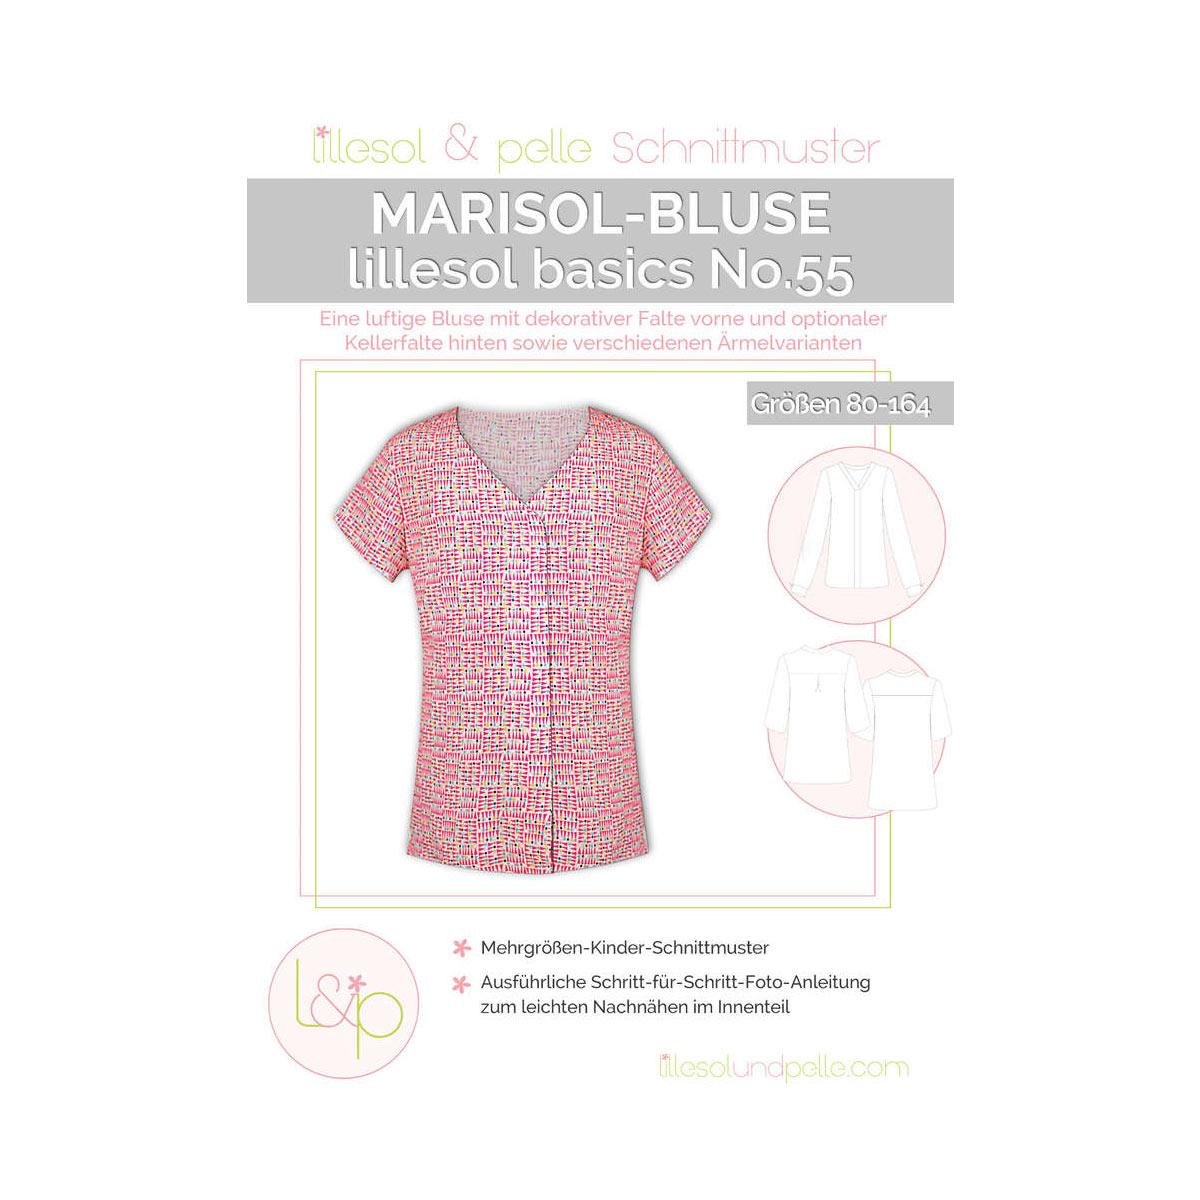 LILLESOL Basics Papierschnittmuster No.55 Marisol-Bluse